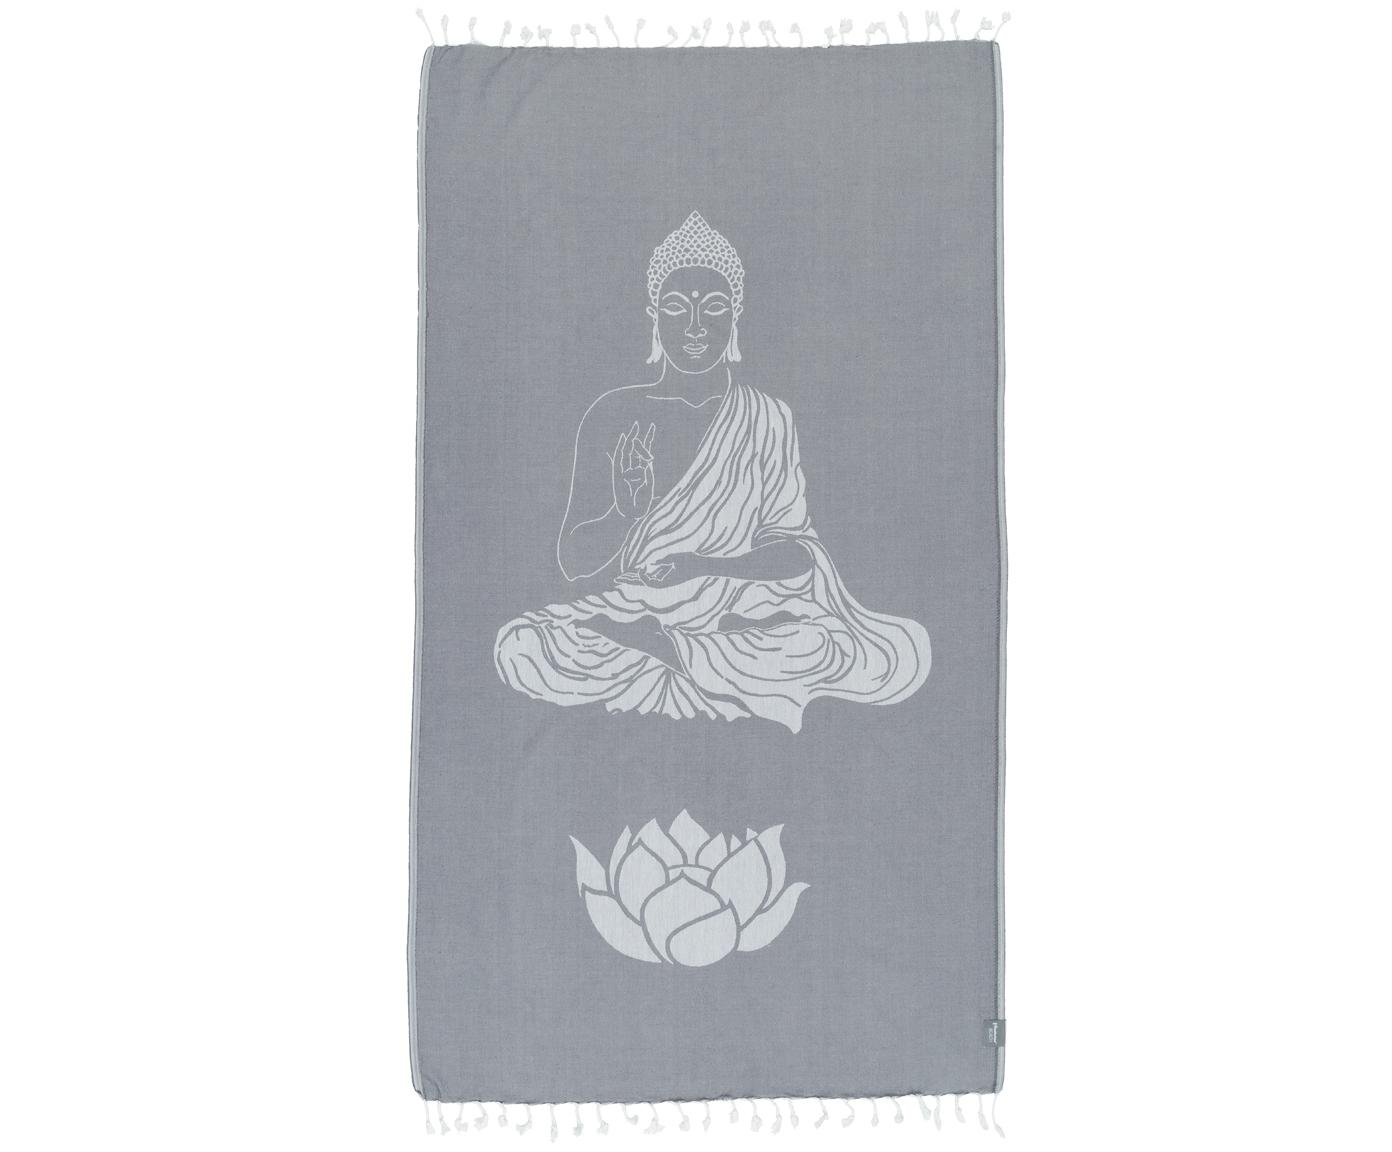 Telo fouta in cotone Buddha, Cotone, qualità leggera, 180 g/m², Grigio, bianco latteo, Larg. 100 x Lung. 180 cm